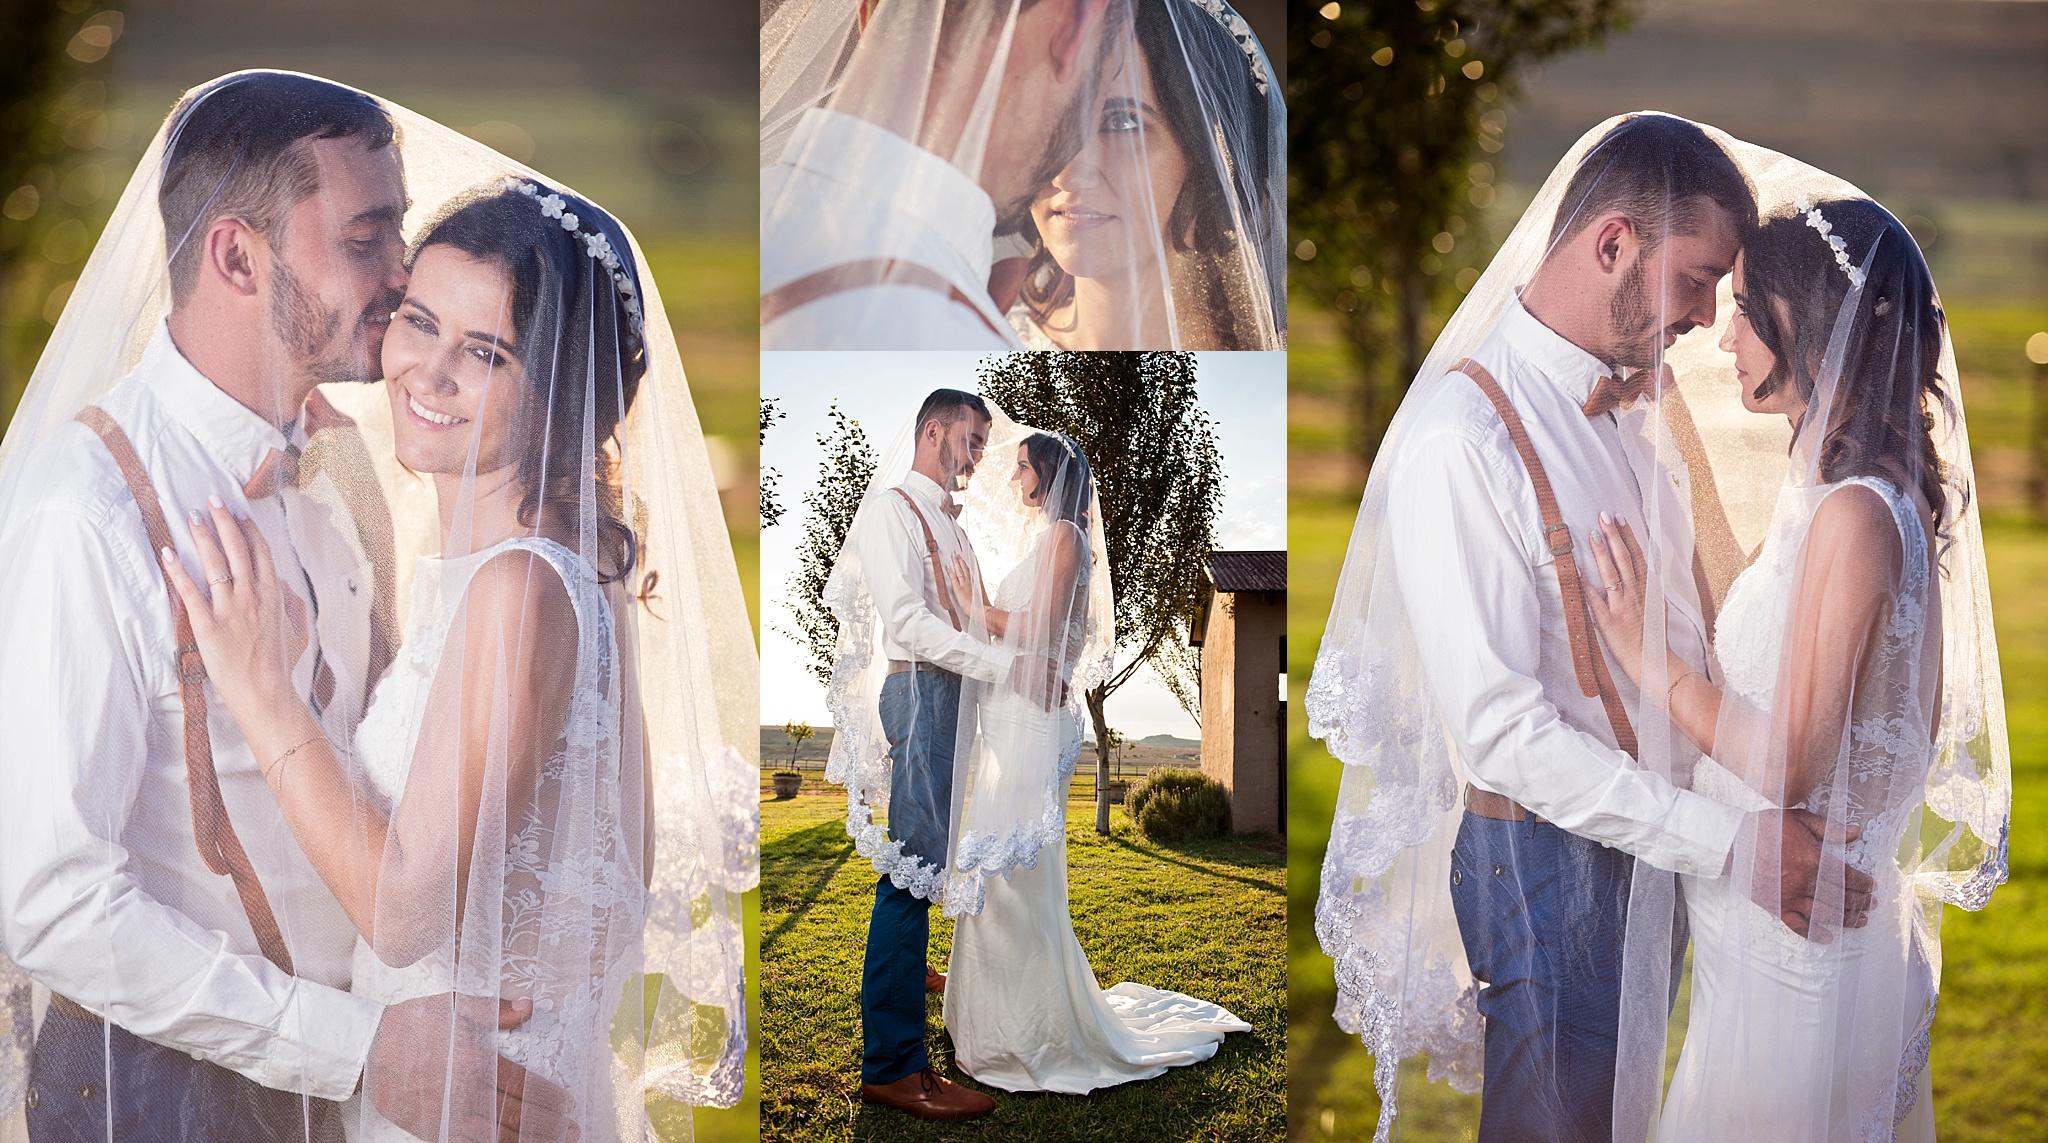 bridal-veil-creative-shoot-ideas.jpg